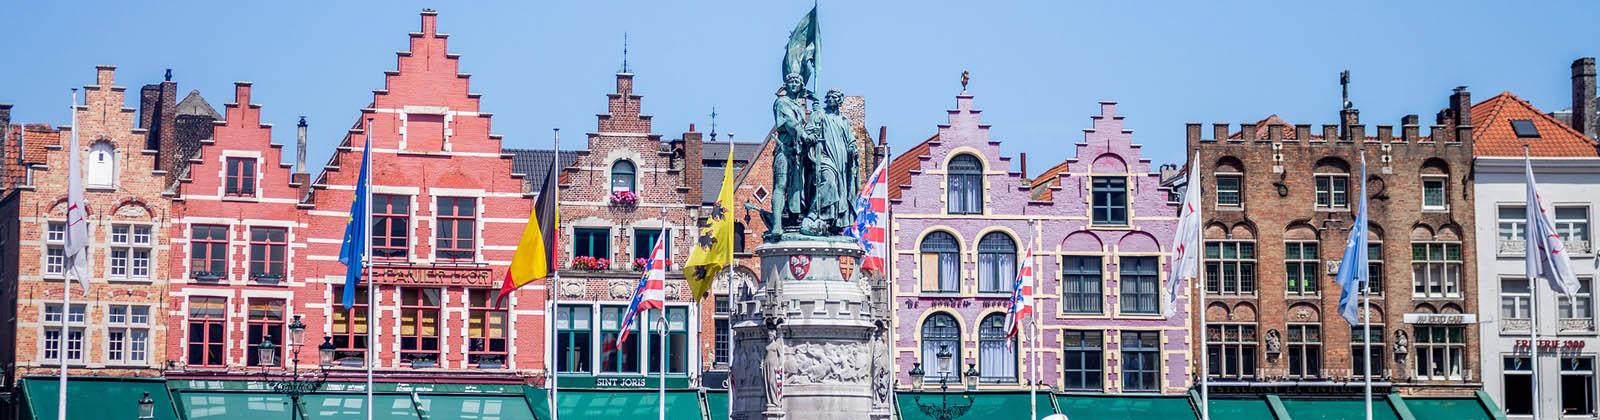 DMC-Bruges-tour-agency